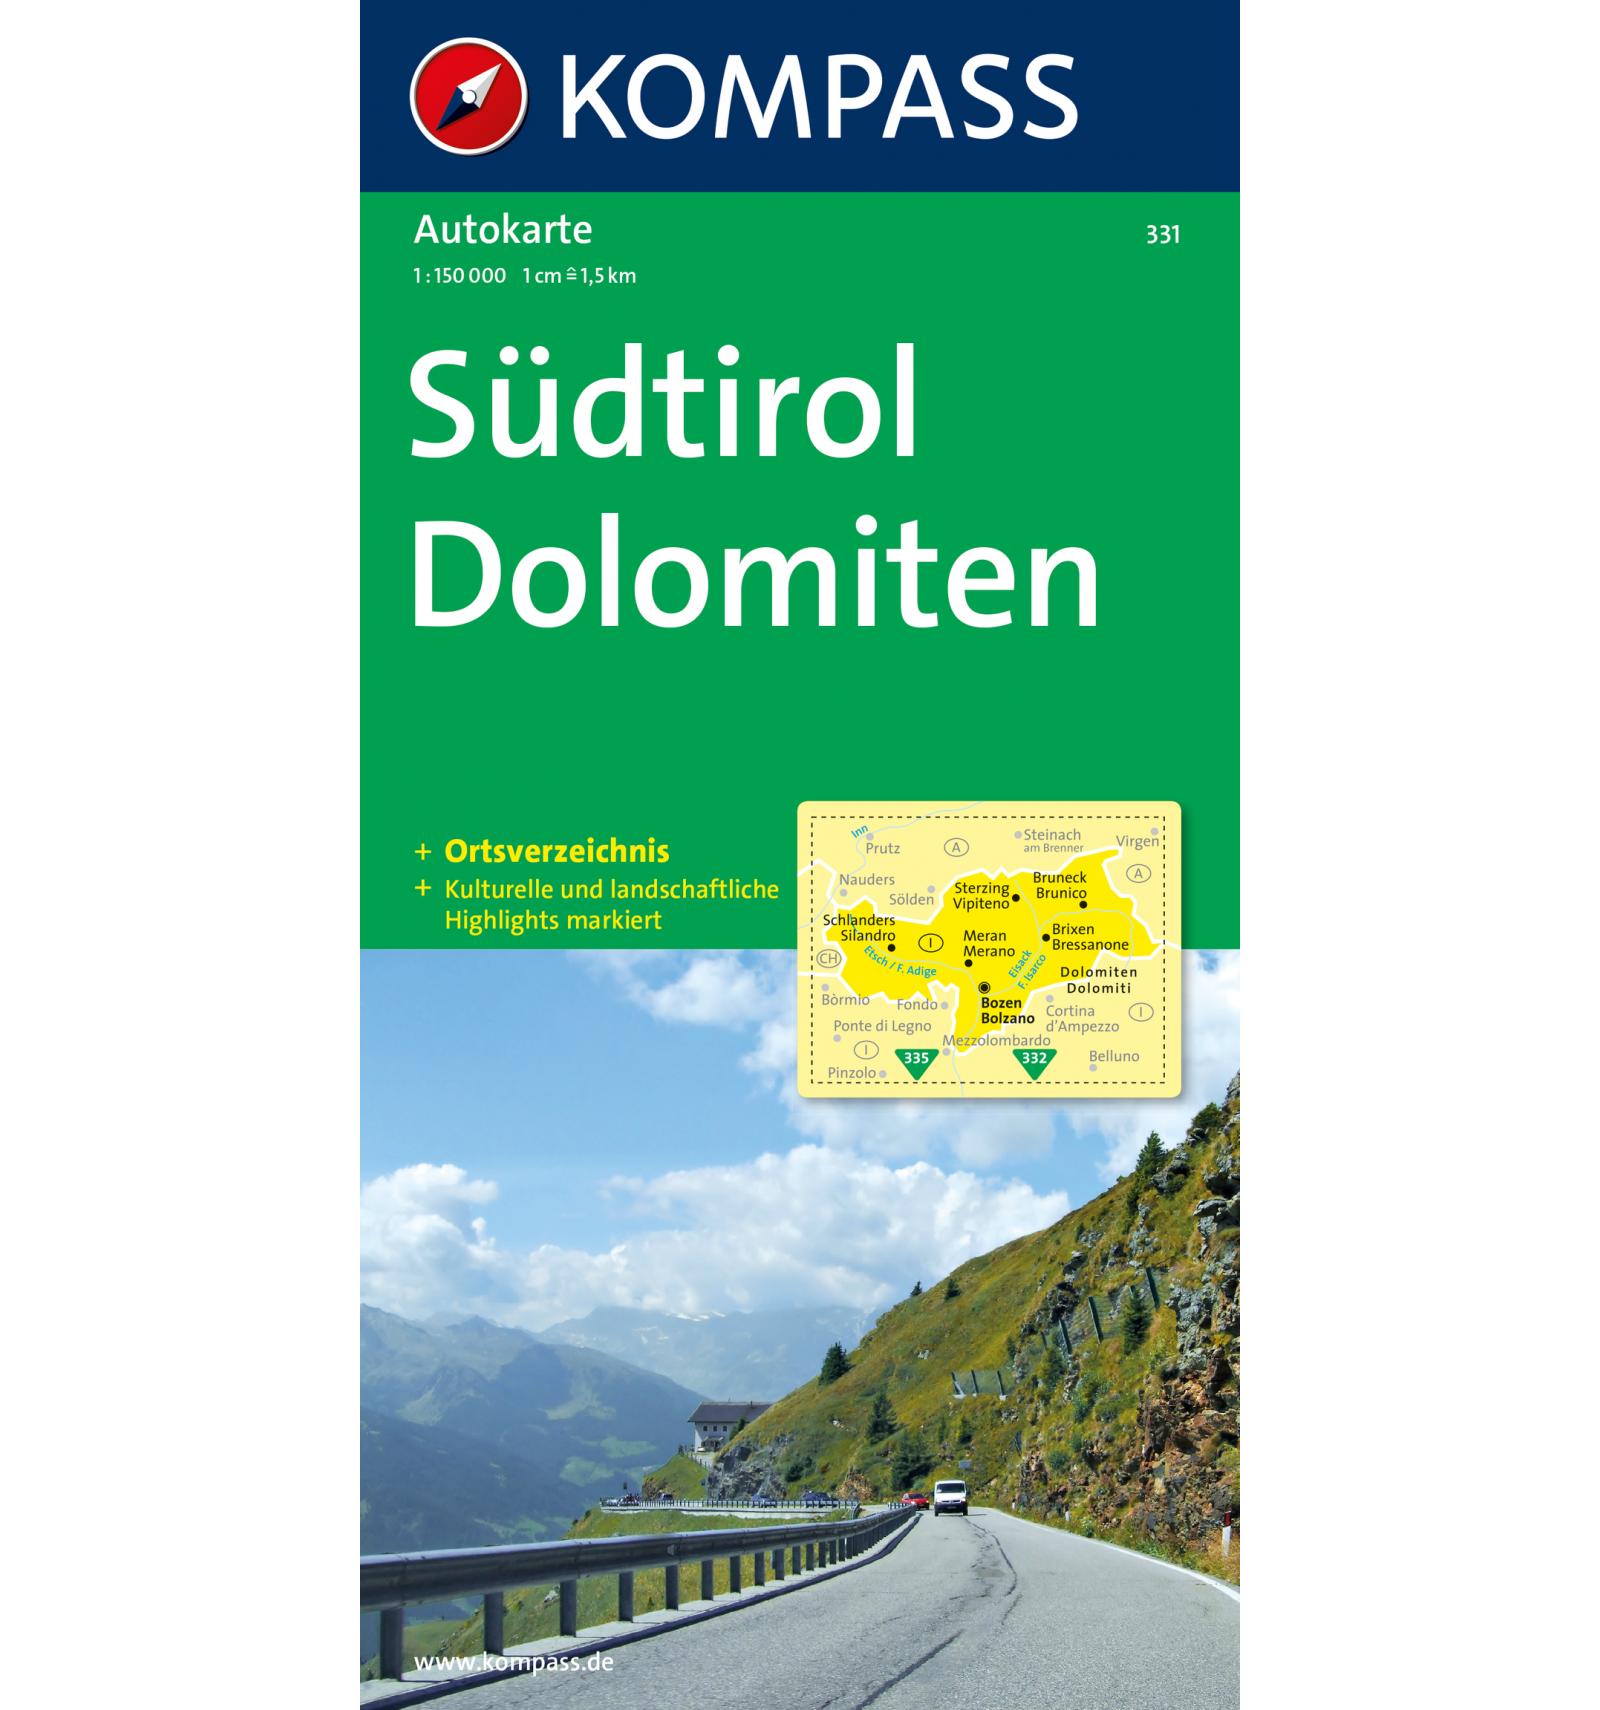 KP-331 Südtirol, Dolomiten Autokarte 1:150.000 9783854911838  Kompass   Landkaarten en wegenkaarten Zuid-Tirol, Dolomieten